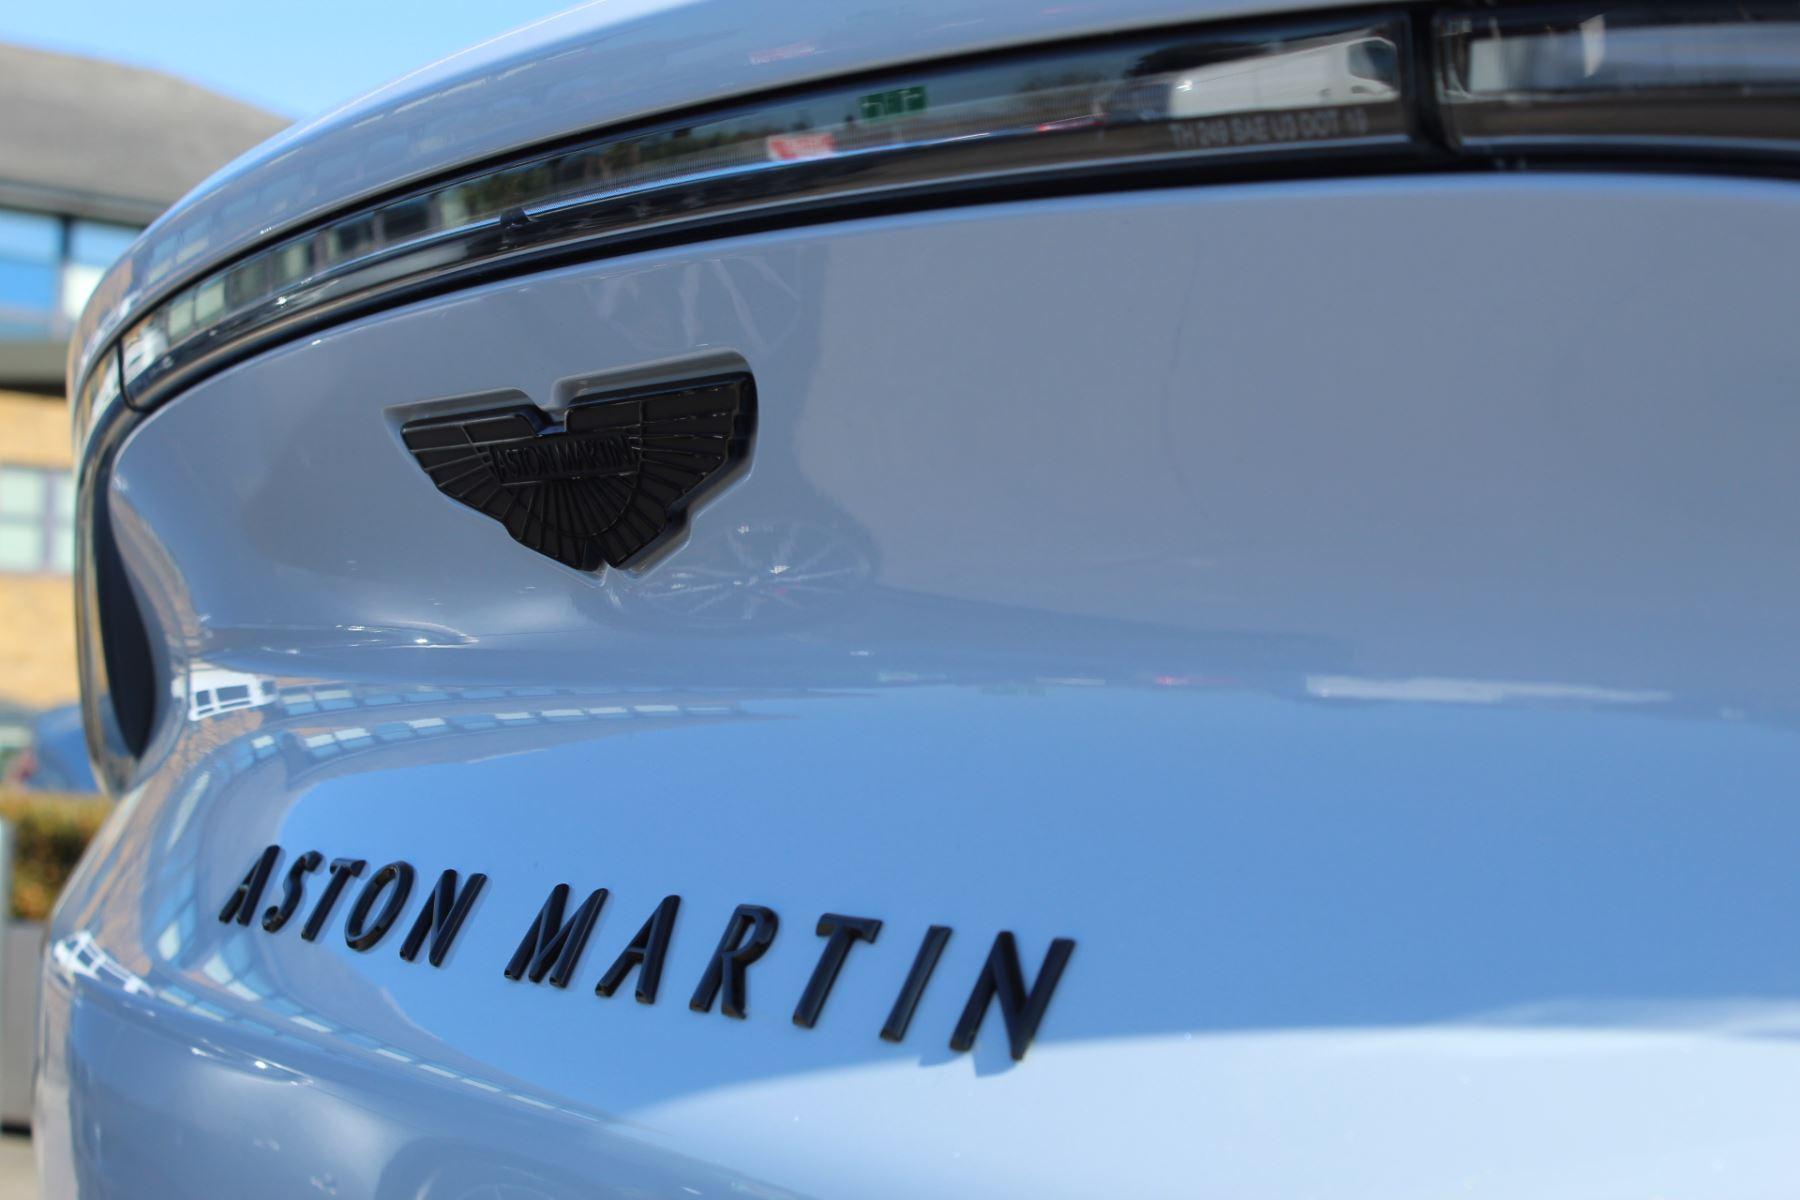 Aston Martin DBX V8 Twin Turbo Massive Spec Low mileage image 16